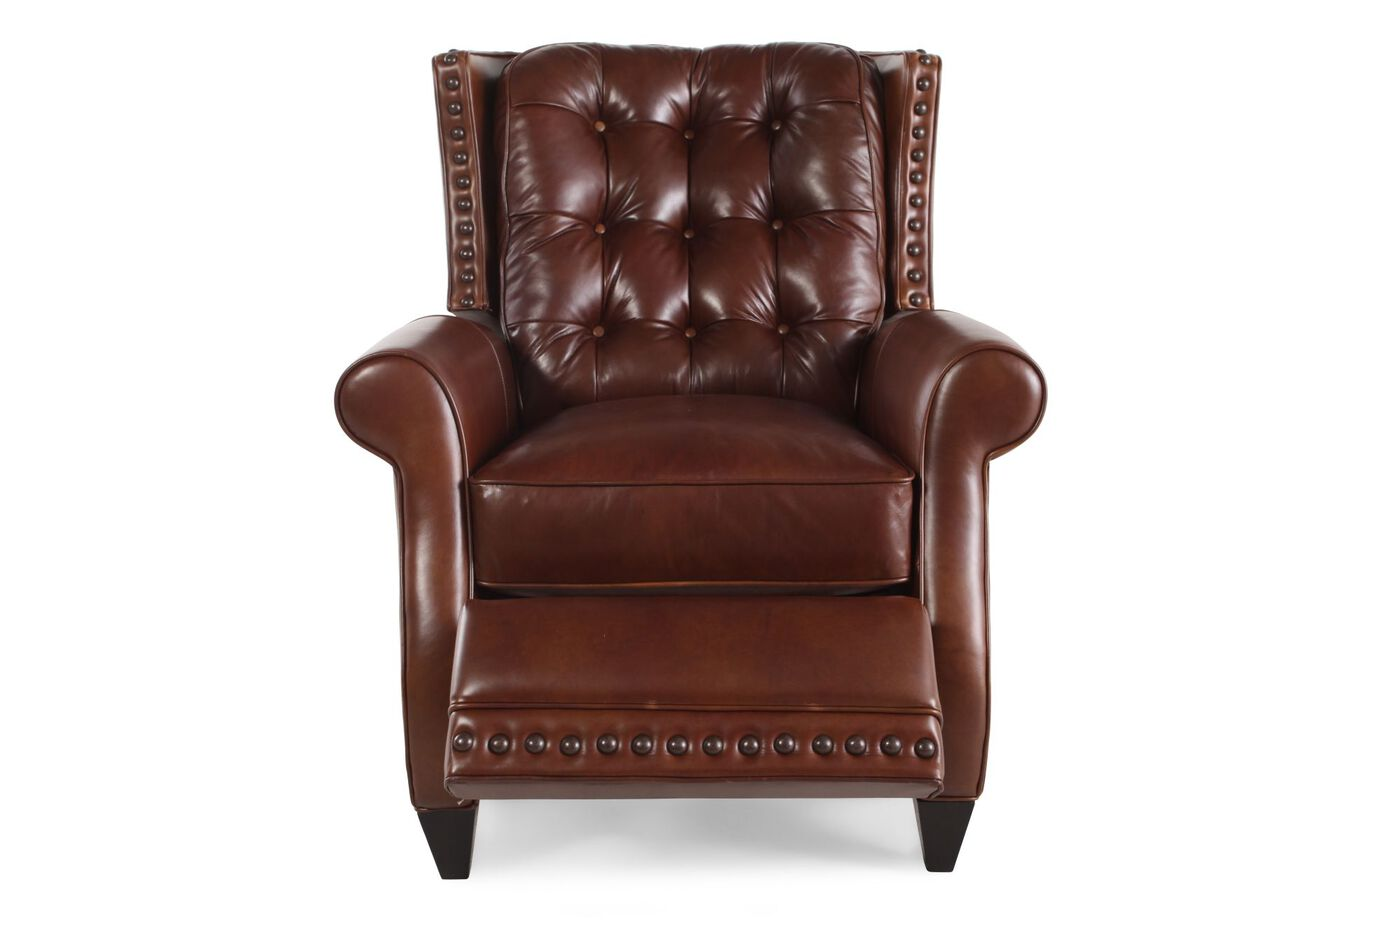 Bernhardt Pierce Leather Recliner Mathis Brothers Furniture